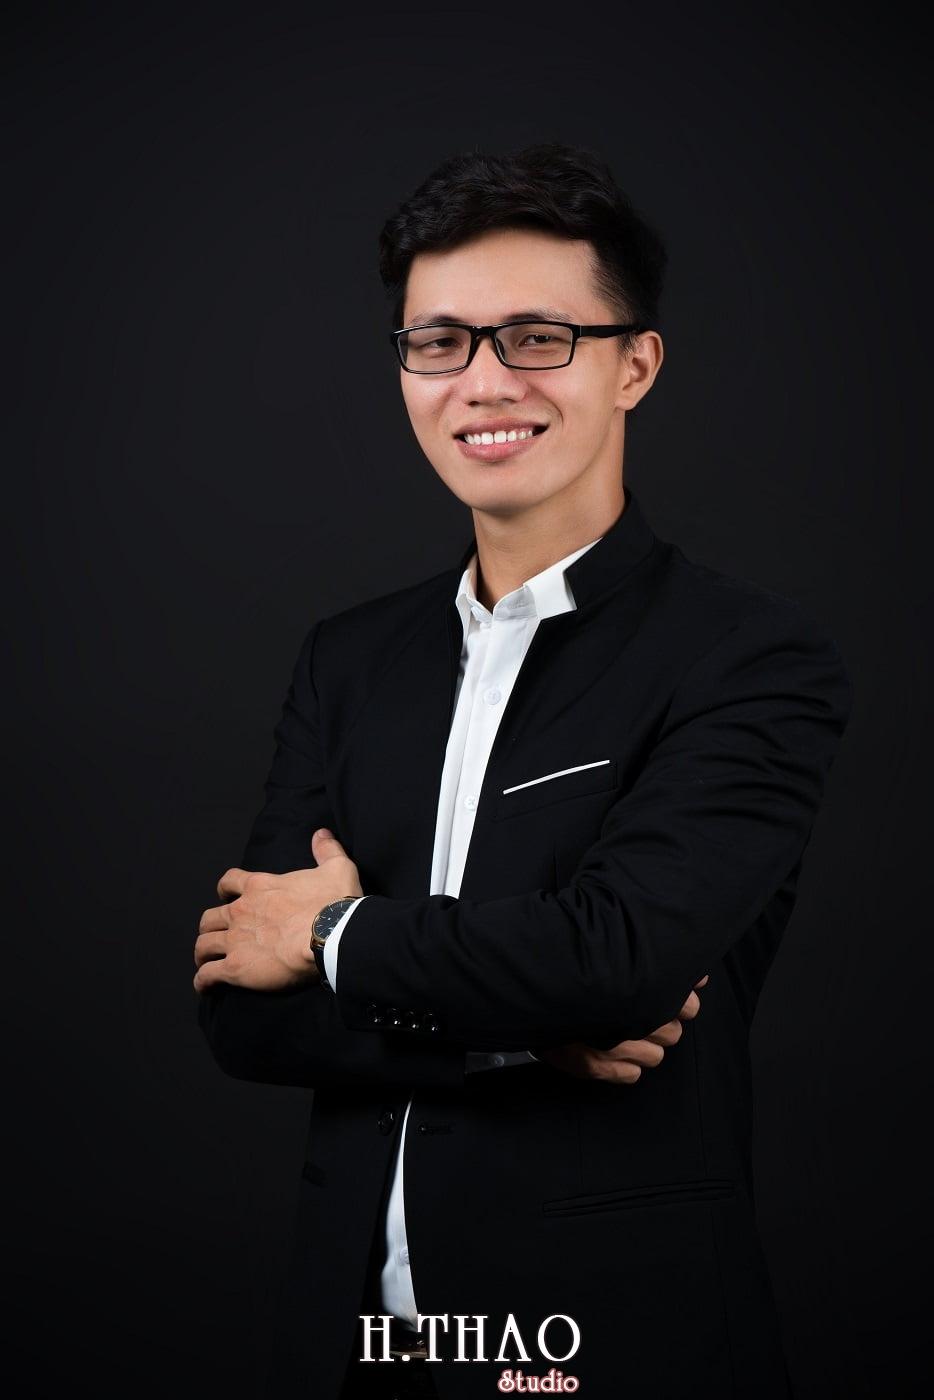 Anh profile chuyen nghiep dep